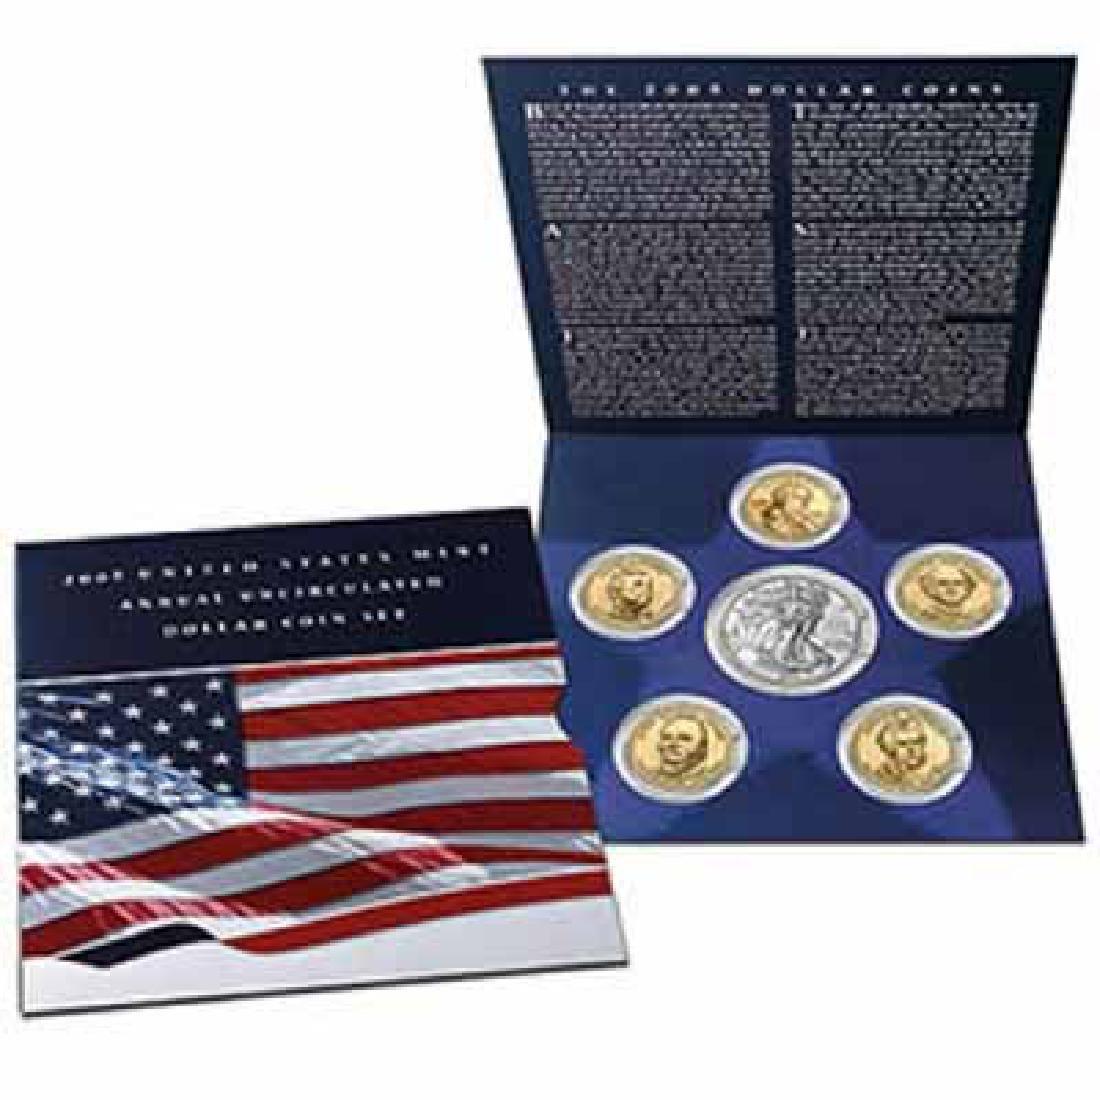 2007 U.S. Mint Annual Uncirculated Dollar Coin Set